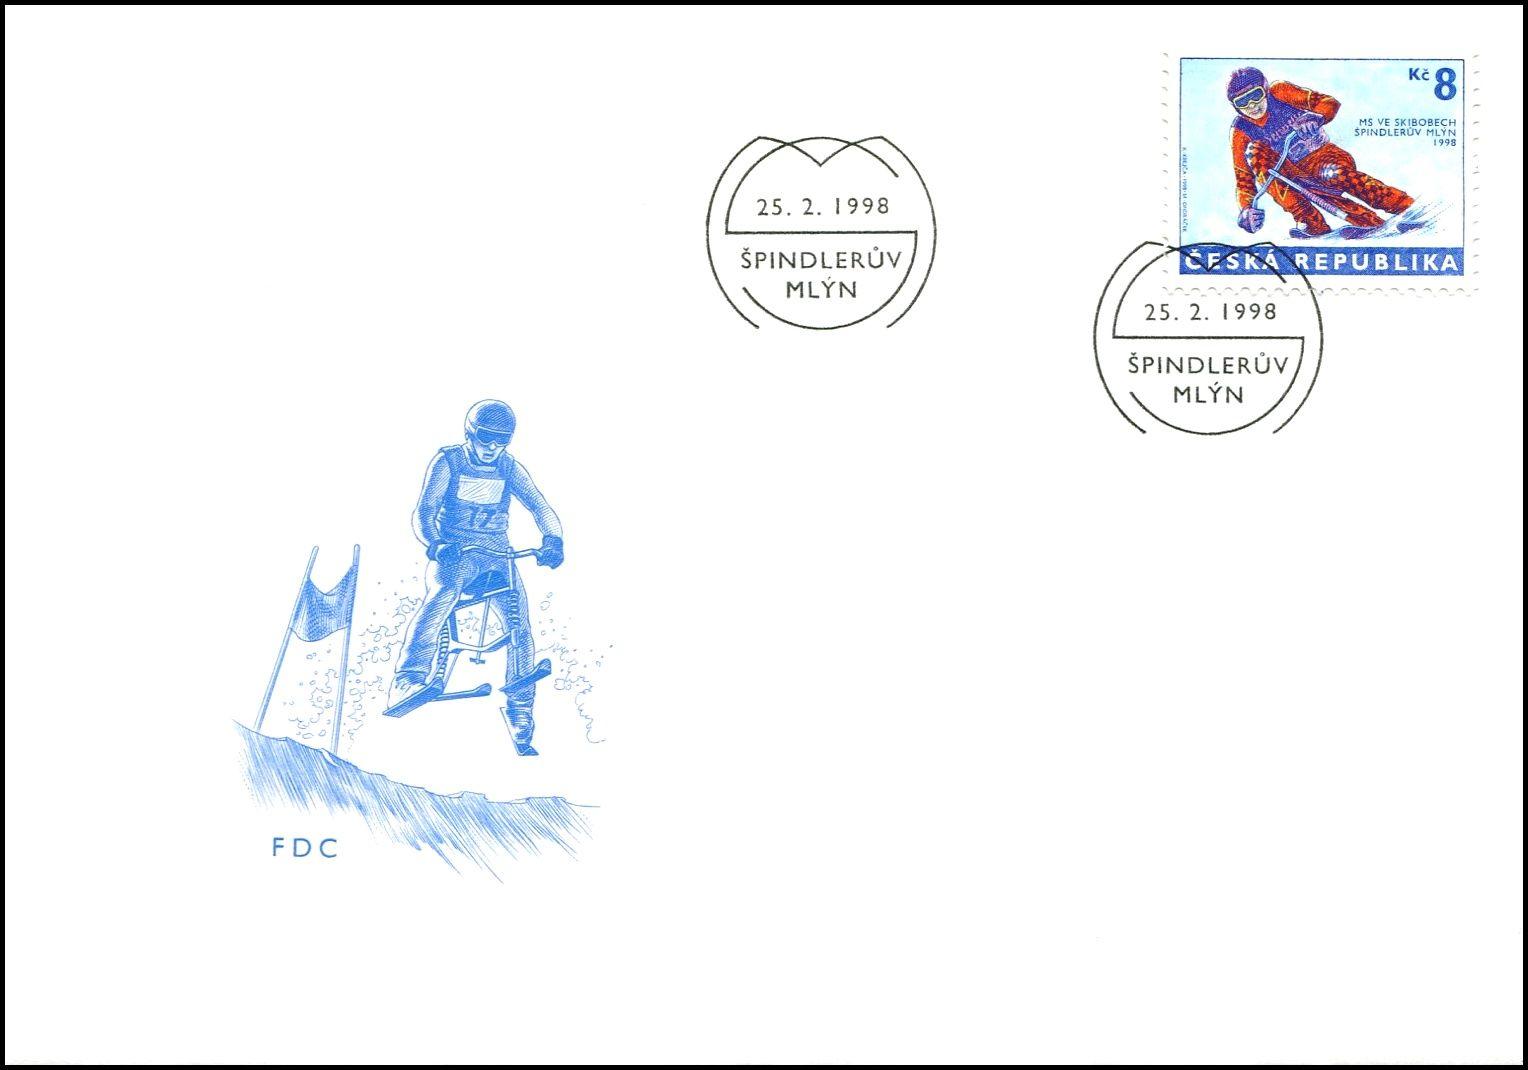 (1998) FDC 170 - MS ve skibobech